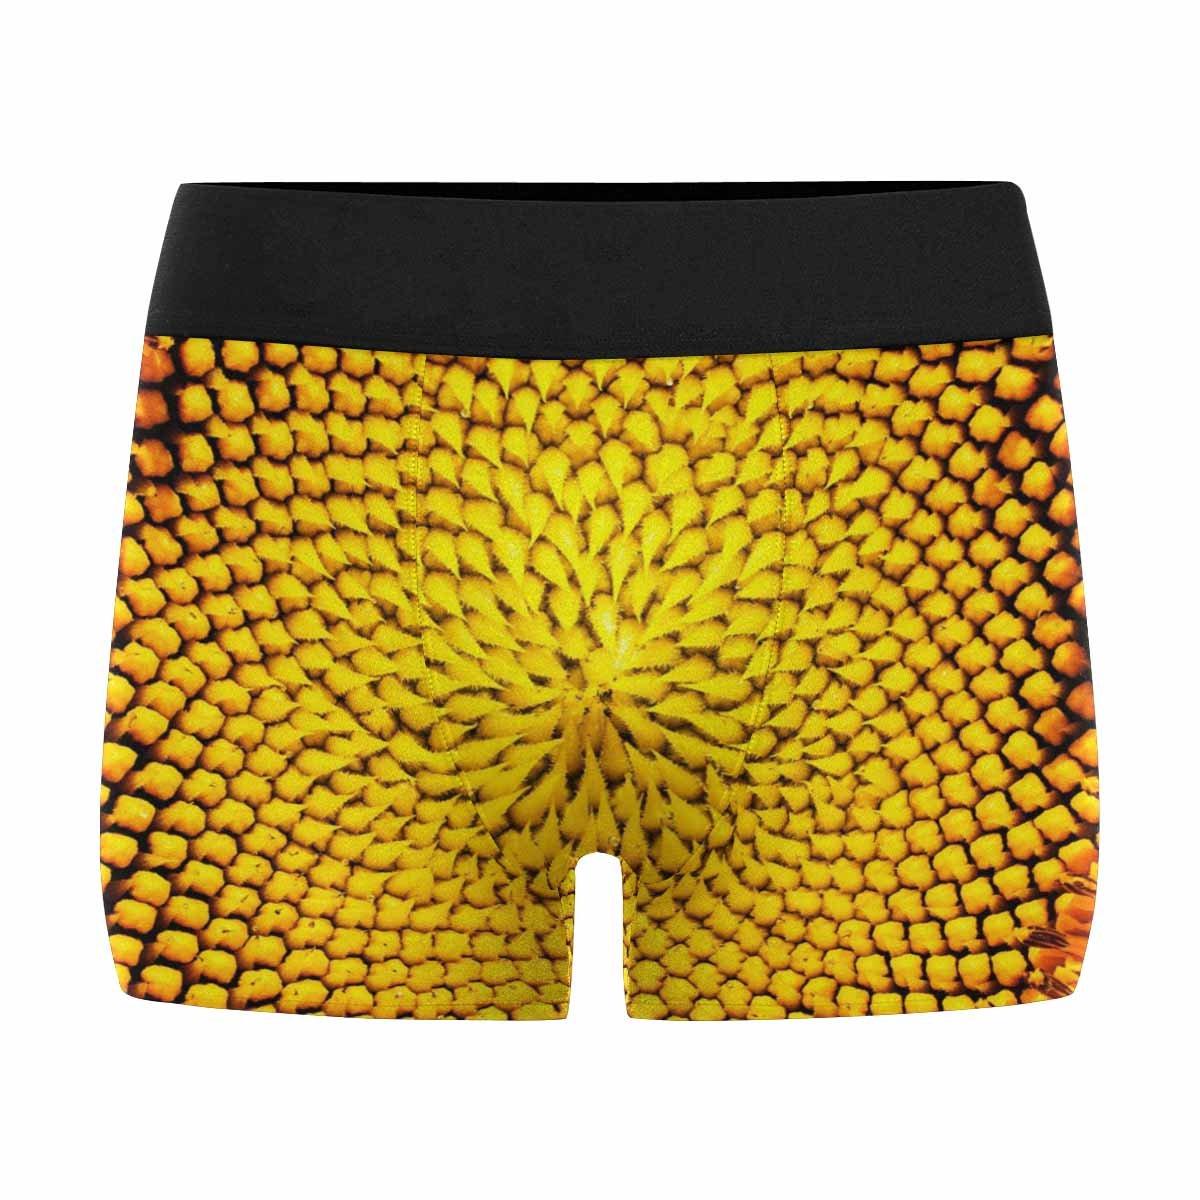 INTERESTPRINT Boxer Briefs Mens Underwear Close Up of Sunflower XS-3XL